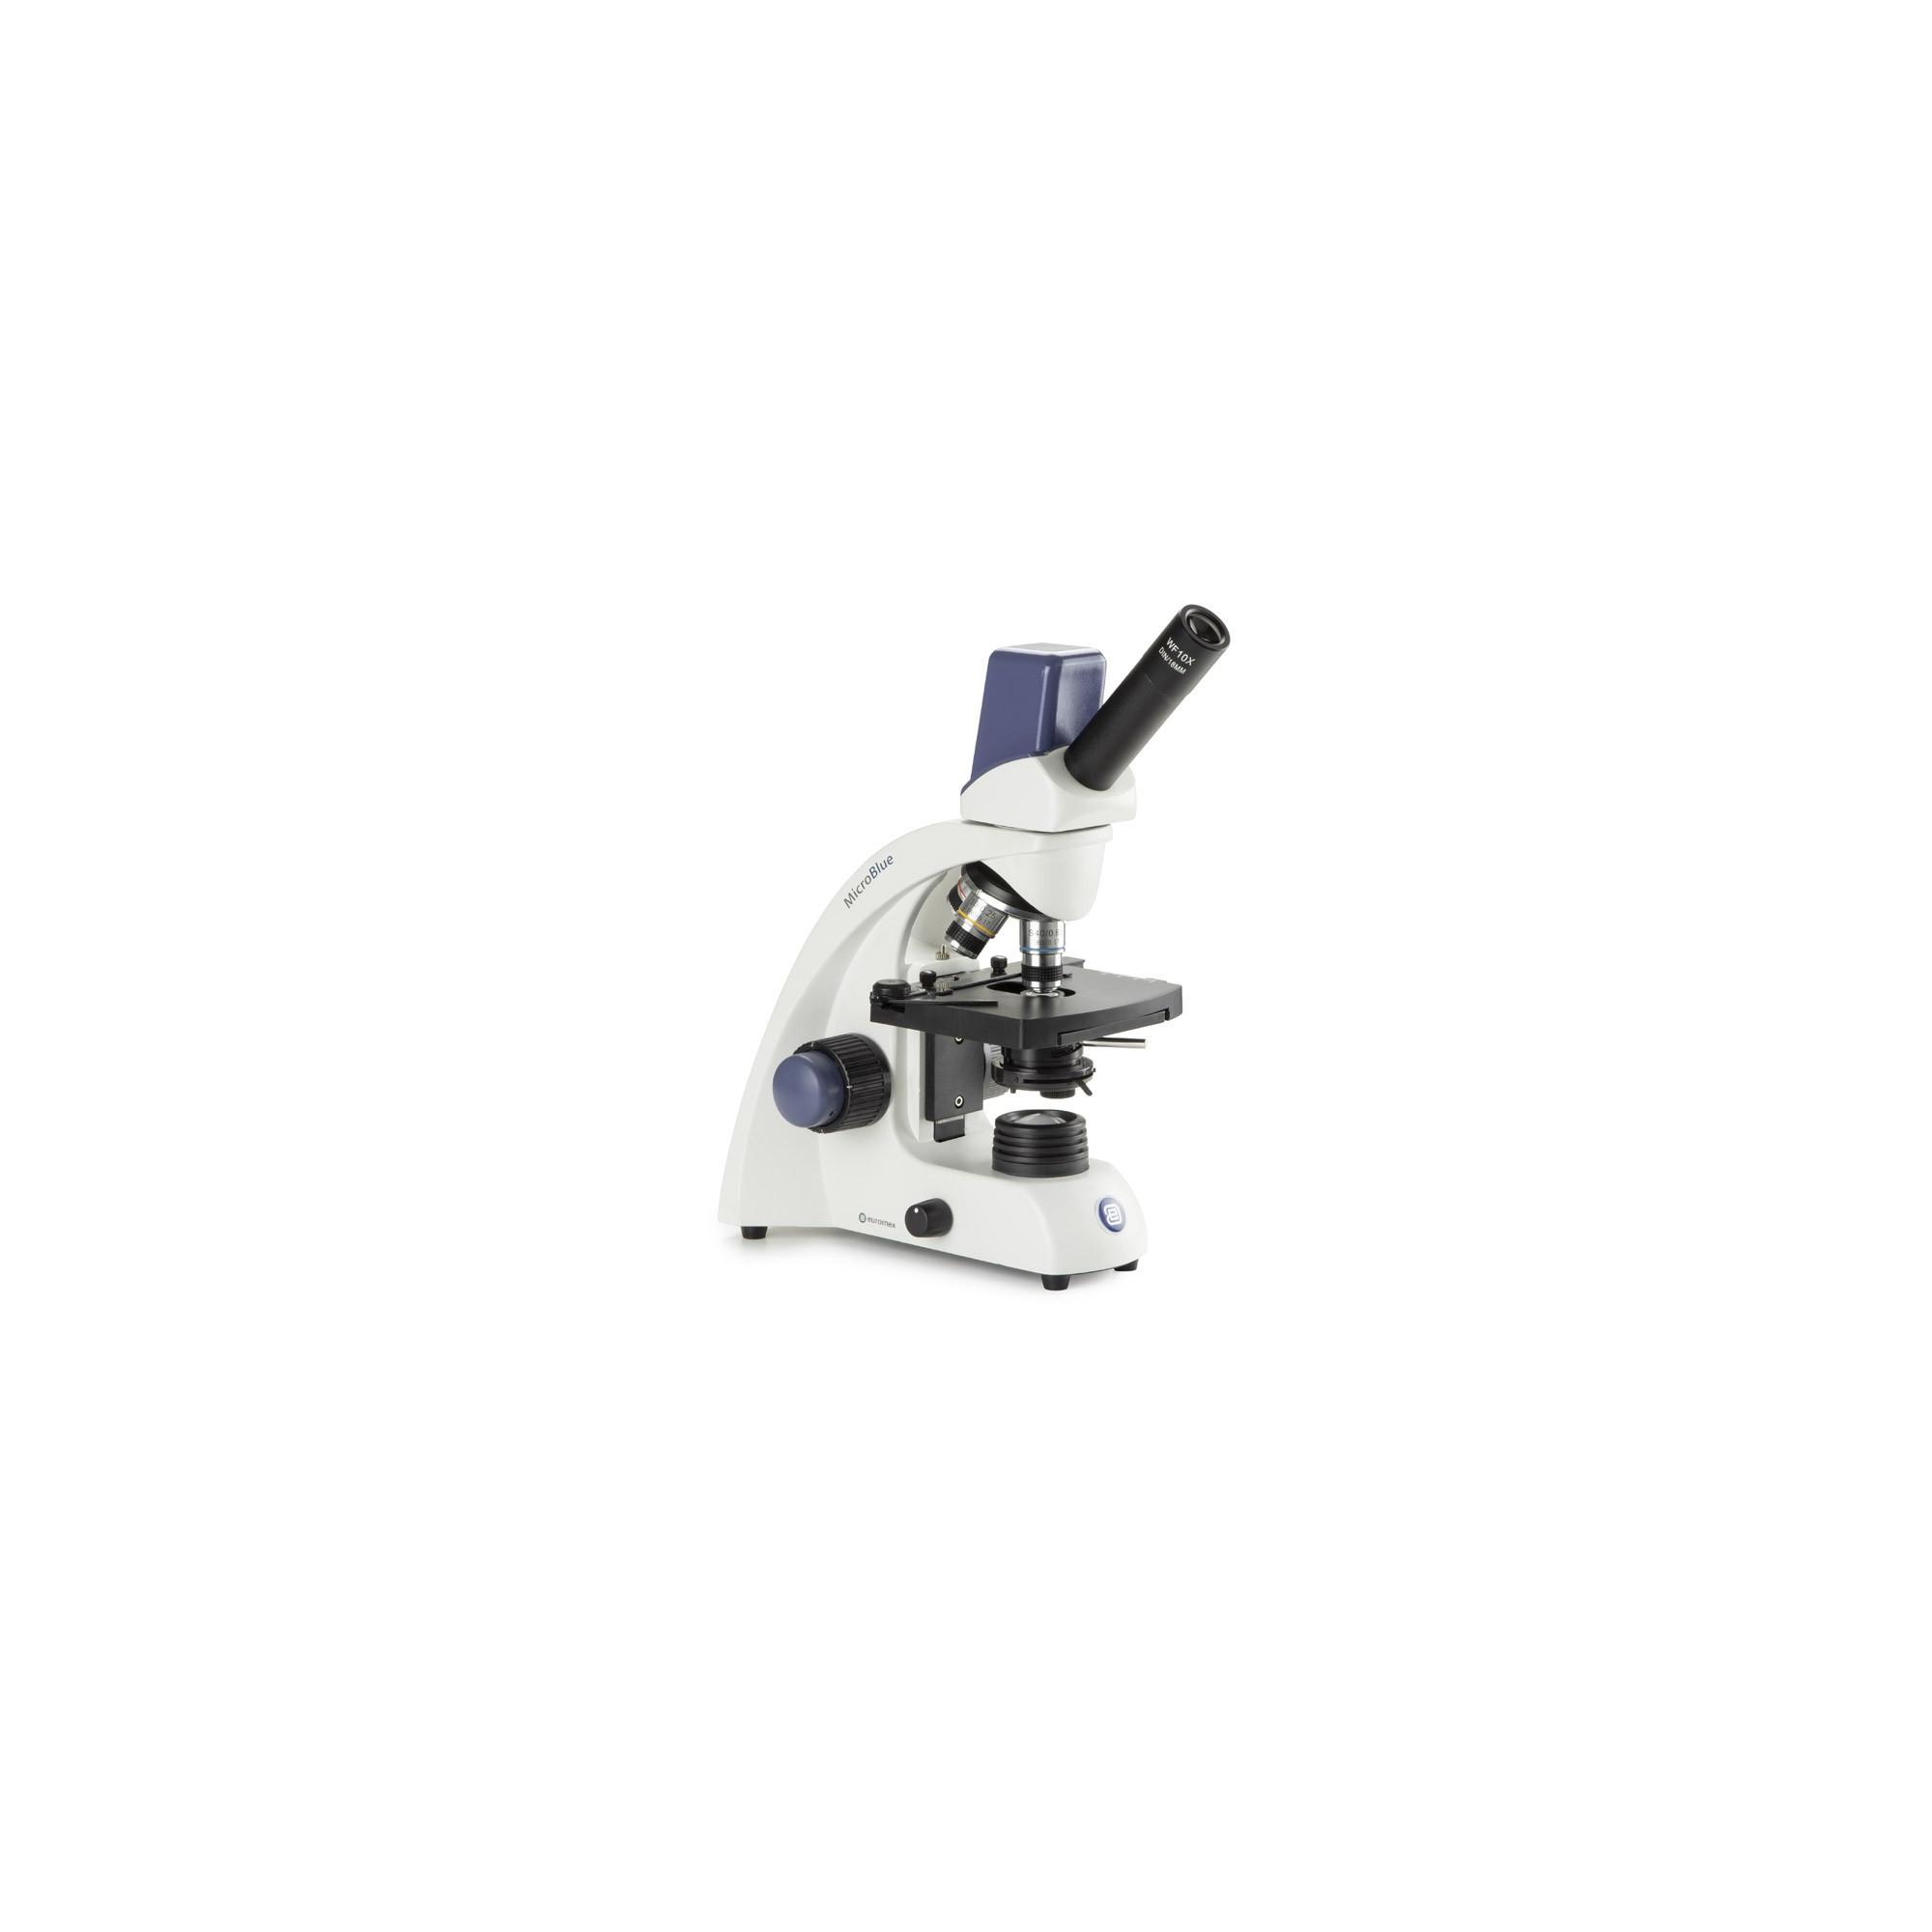 MICROSCOPIO DIGITAL MONOCULAR MICROBLUE MODELO 1155